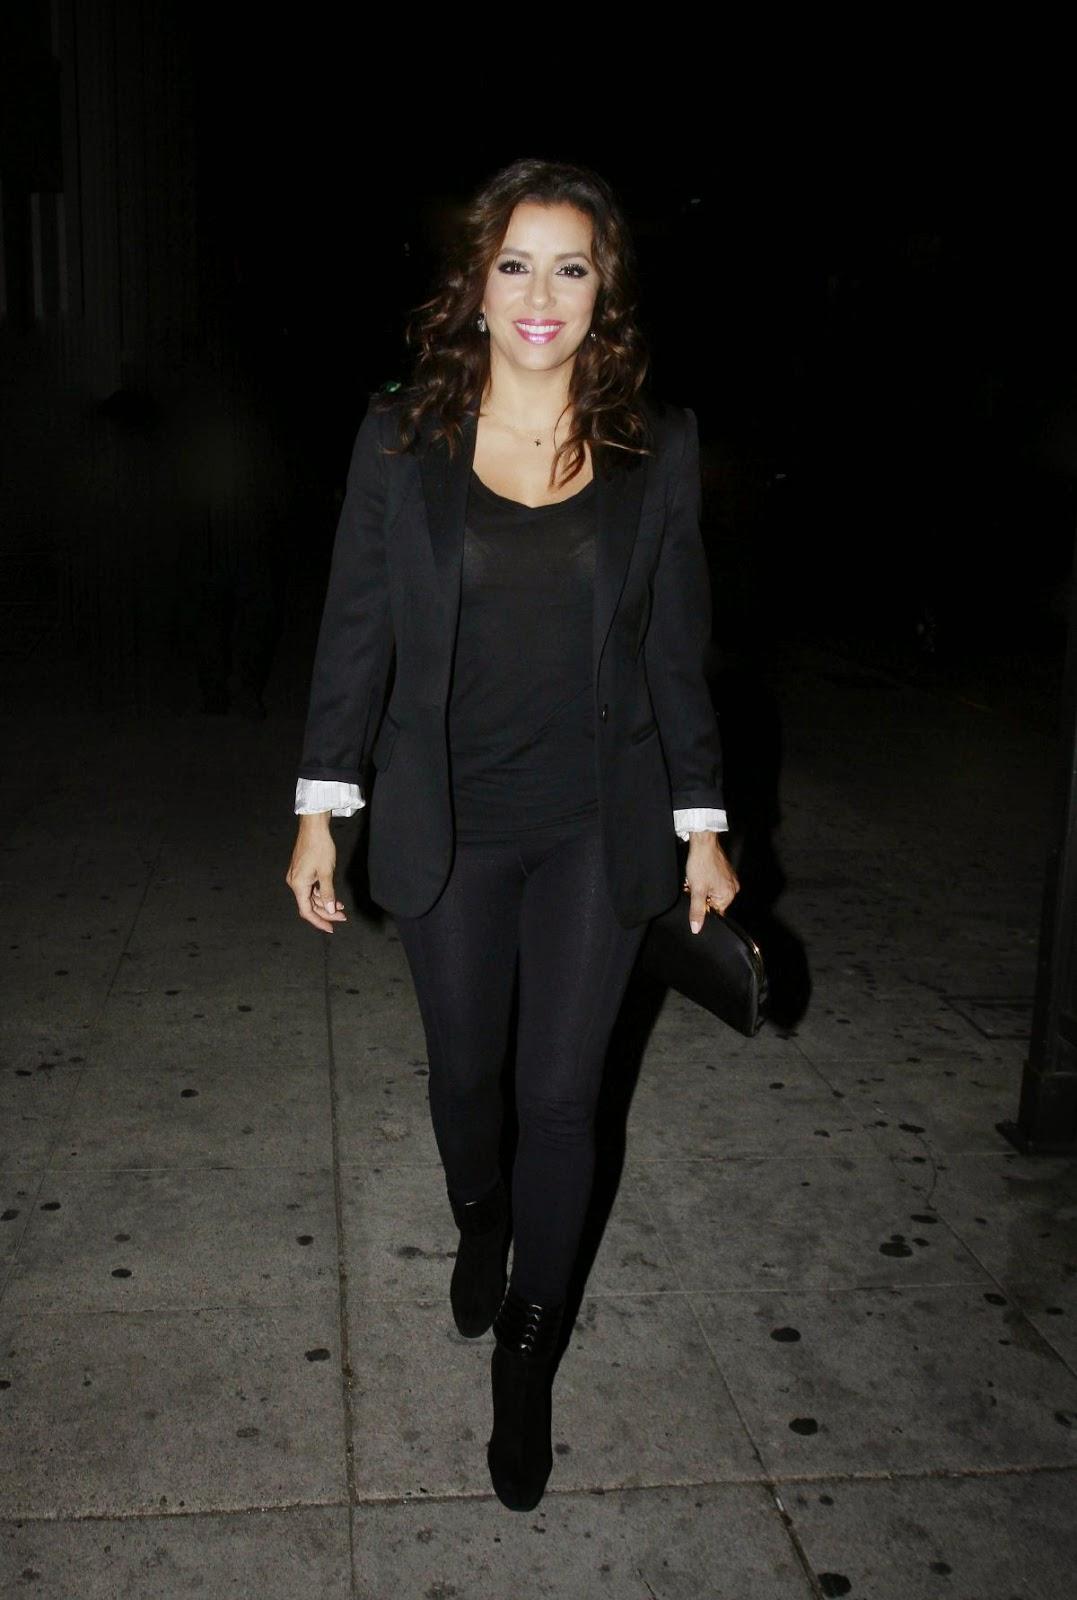 Actress @ Eva Longoria - Leaving A Concert In Los Angeles